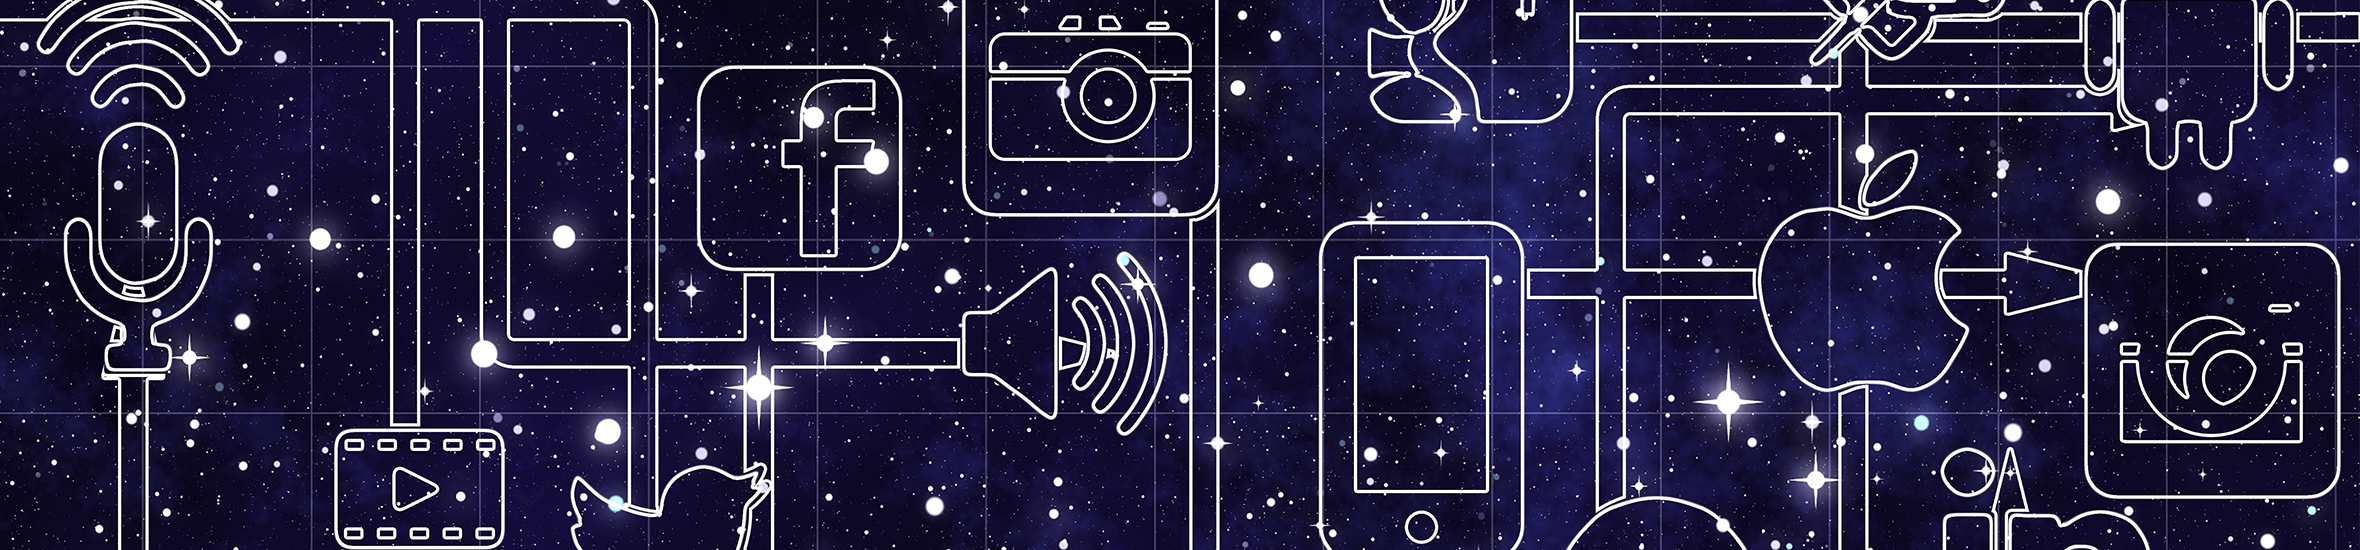 Les 5 tendances Social Media en 2019